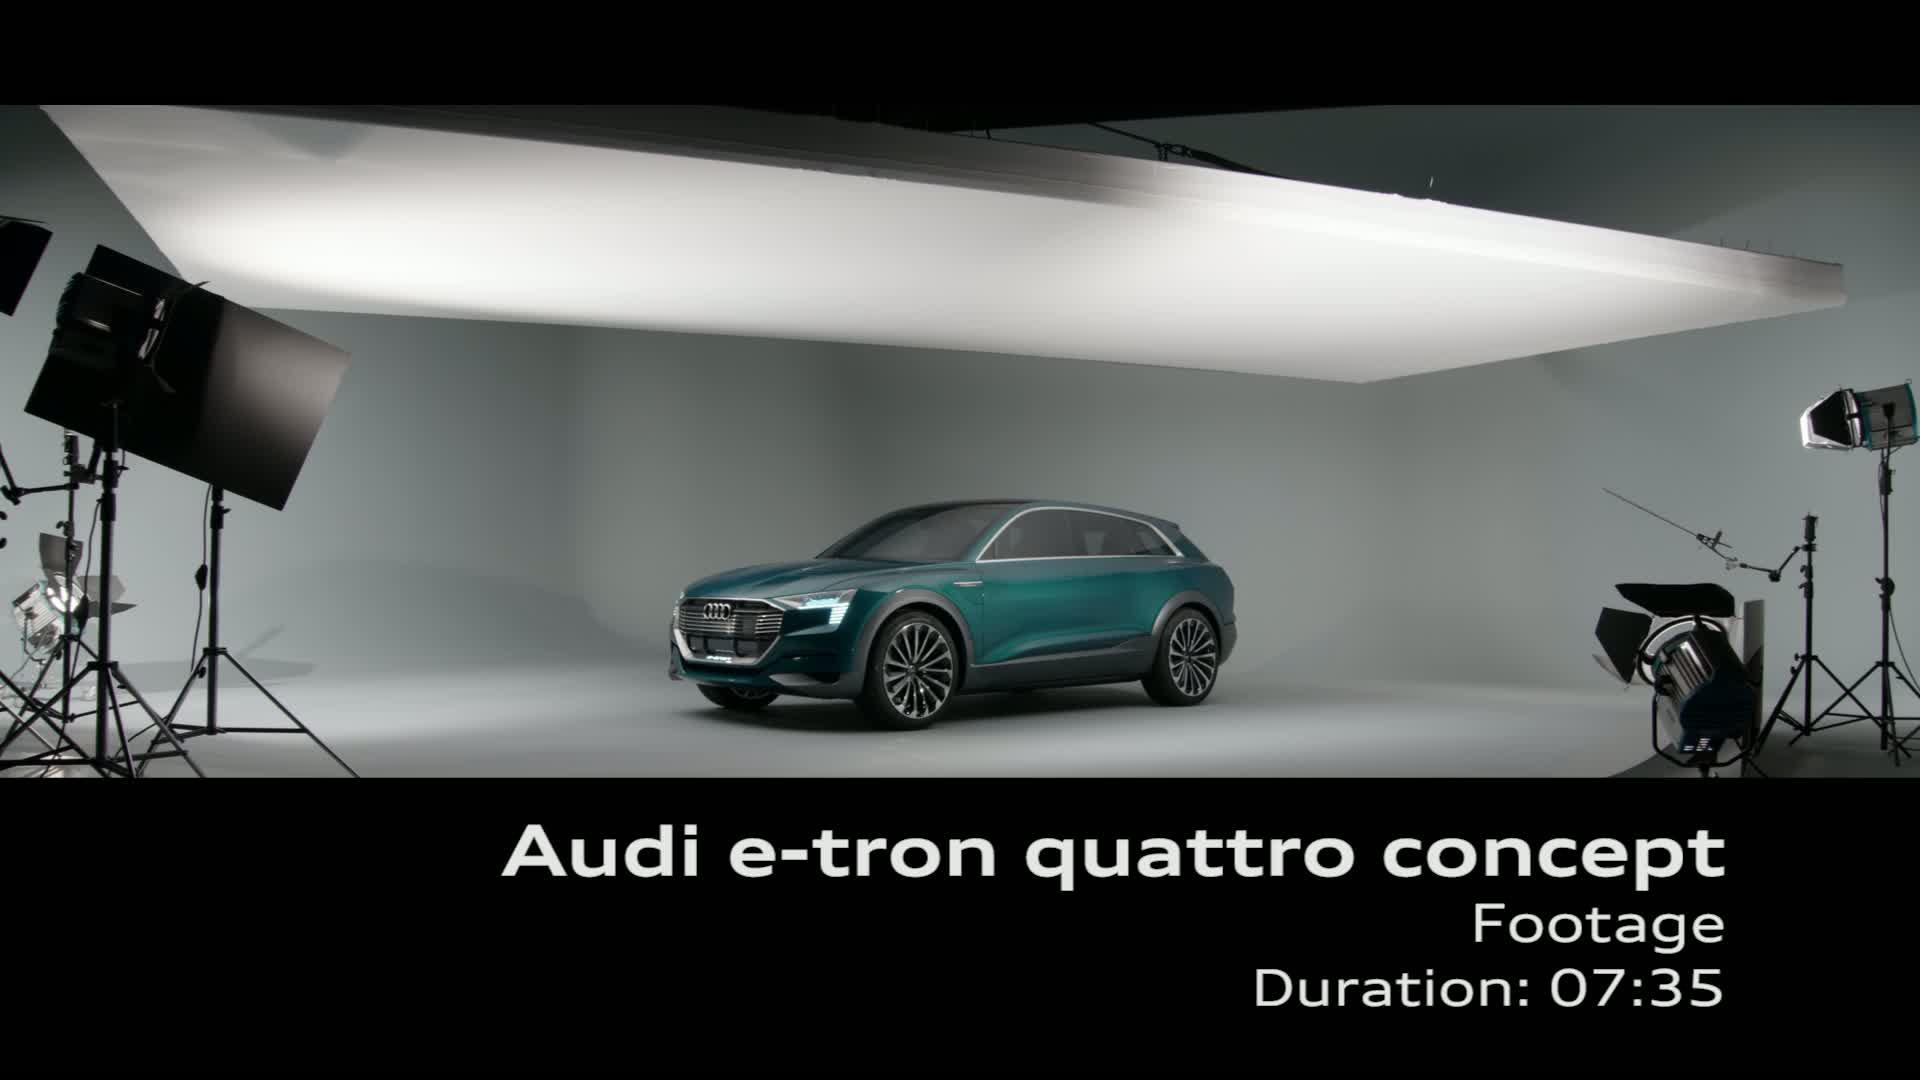 Audi e-tron quattro concept - Footage